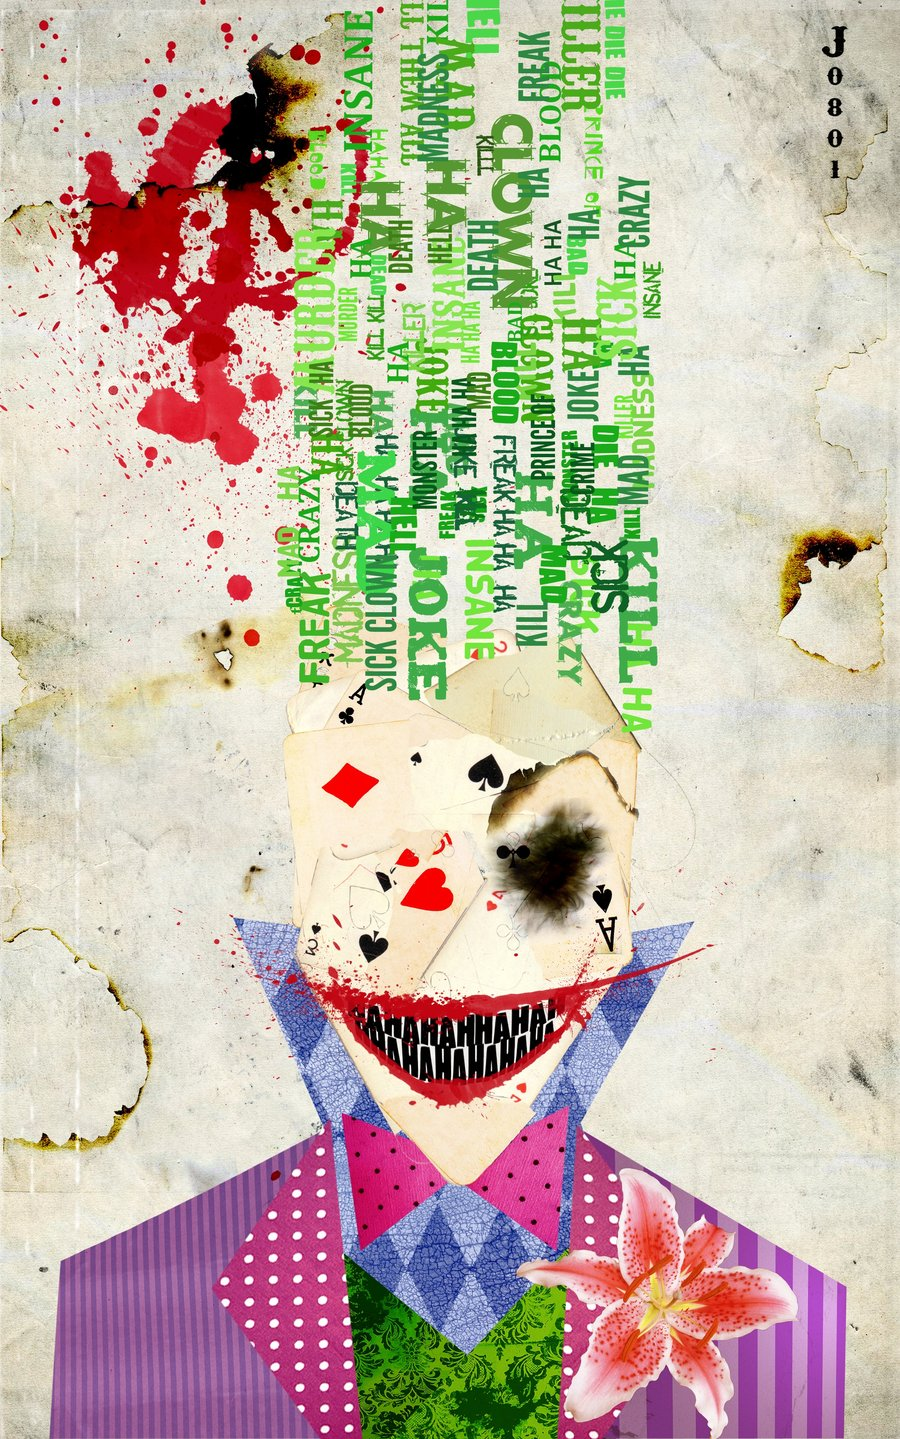 http://1.bp.blogspot.com/_JGgzOkYhIb0/TRNeCKI75OI/AAAAAAAAHpo/2oBQpksIA8o/s1600/The_Joker_by_J0801.jpg